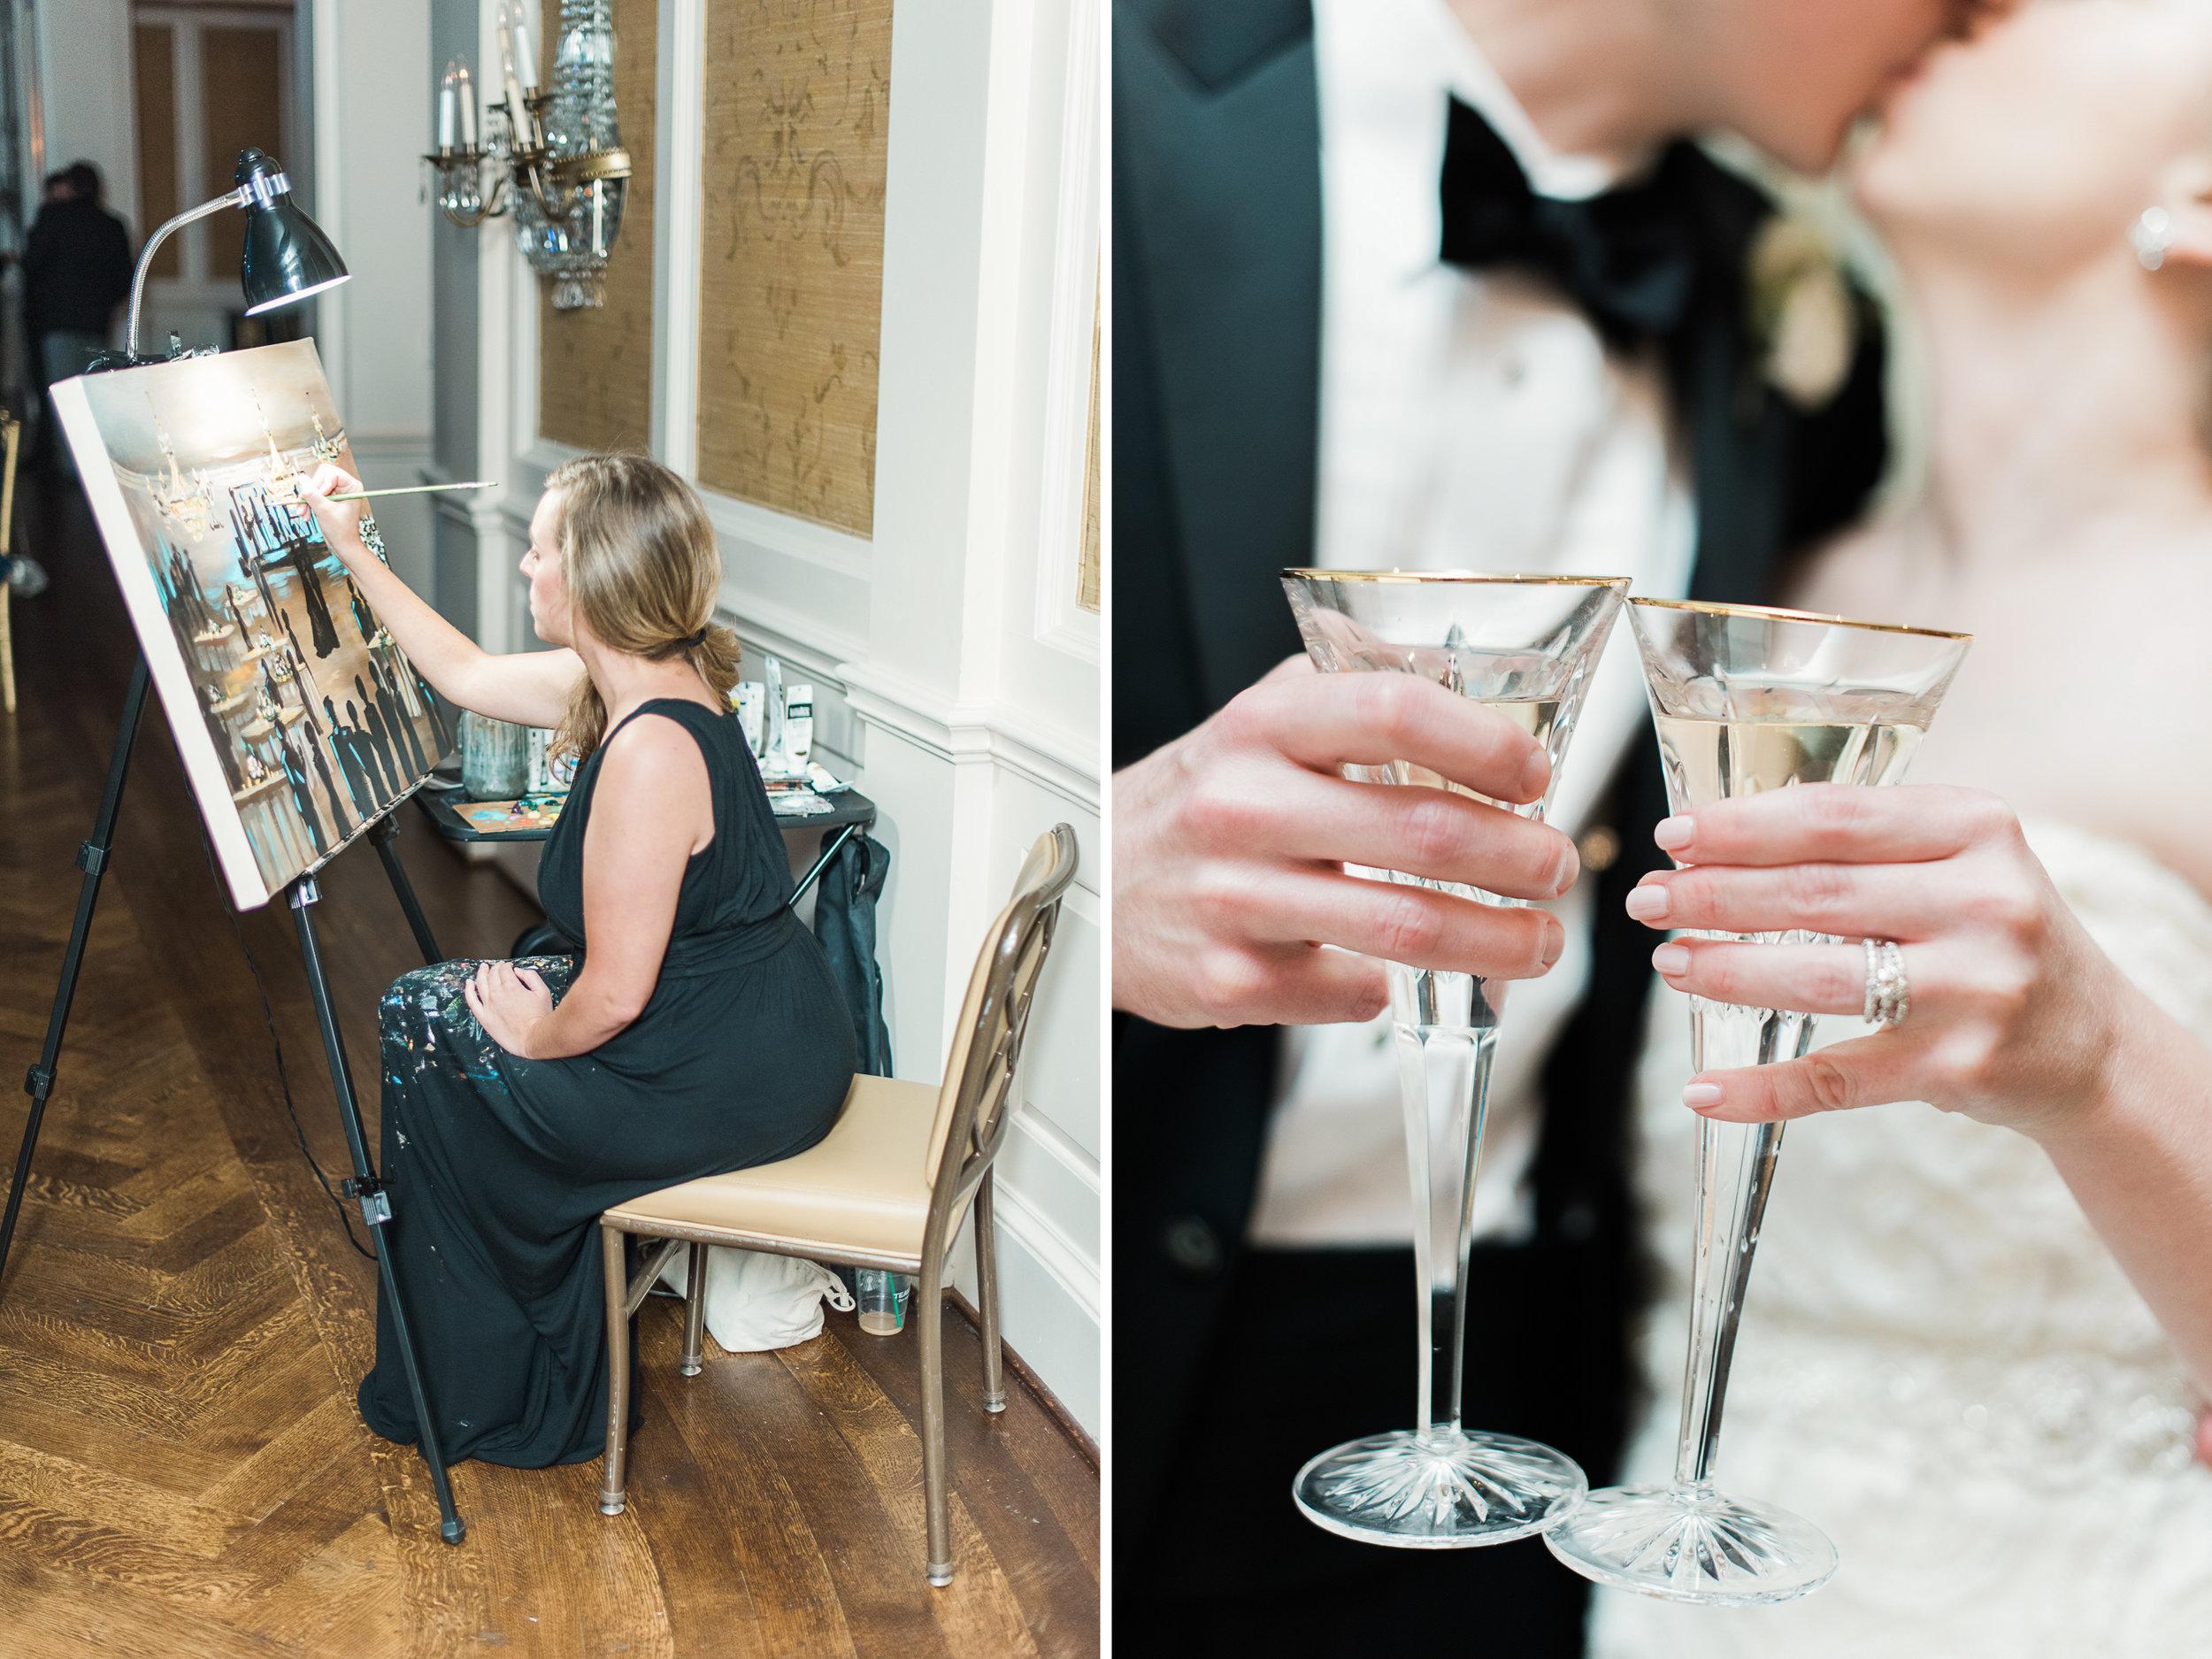 houston-wedding-planner-fine-art-luxury-designer-top-best-destination-austin-dallas-kelly-doonan-events-river-oaks-country-club-178